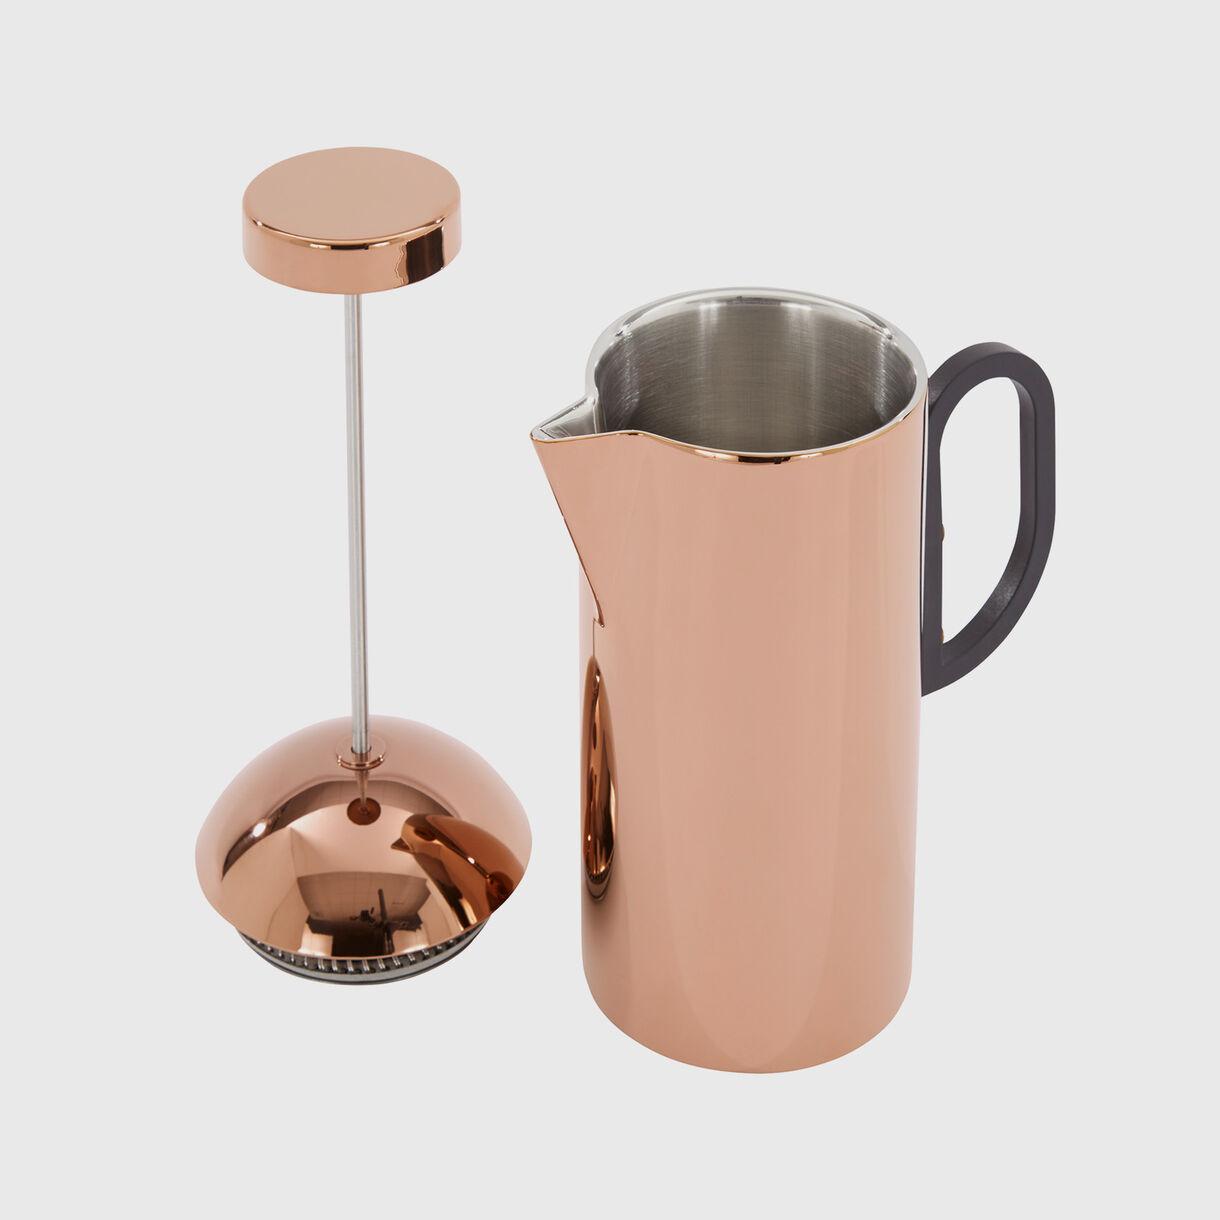 Brew Cafetiere, Copper